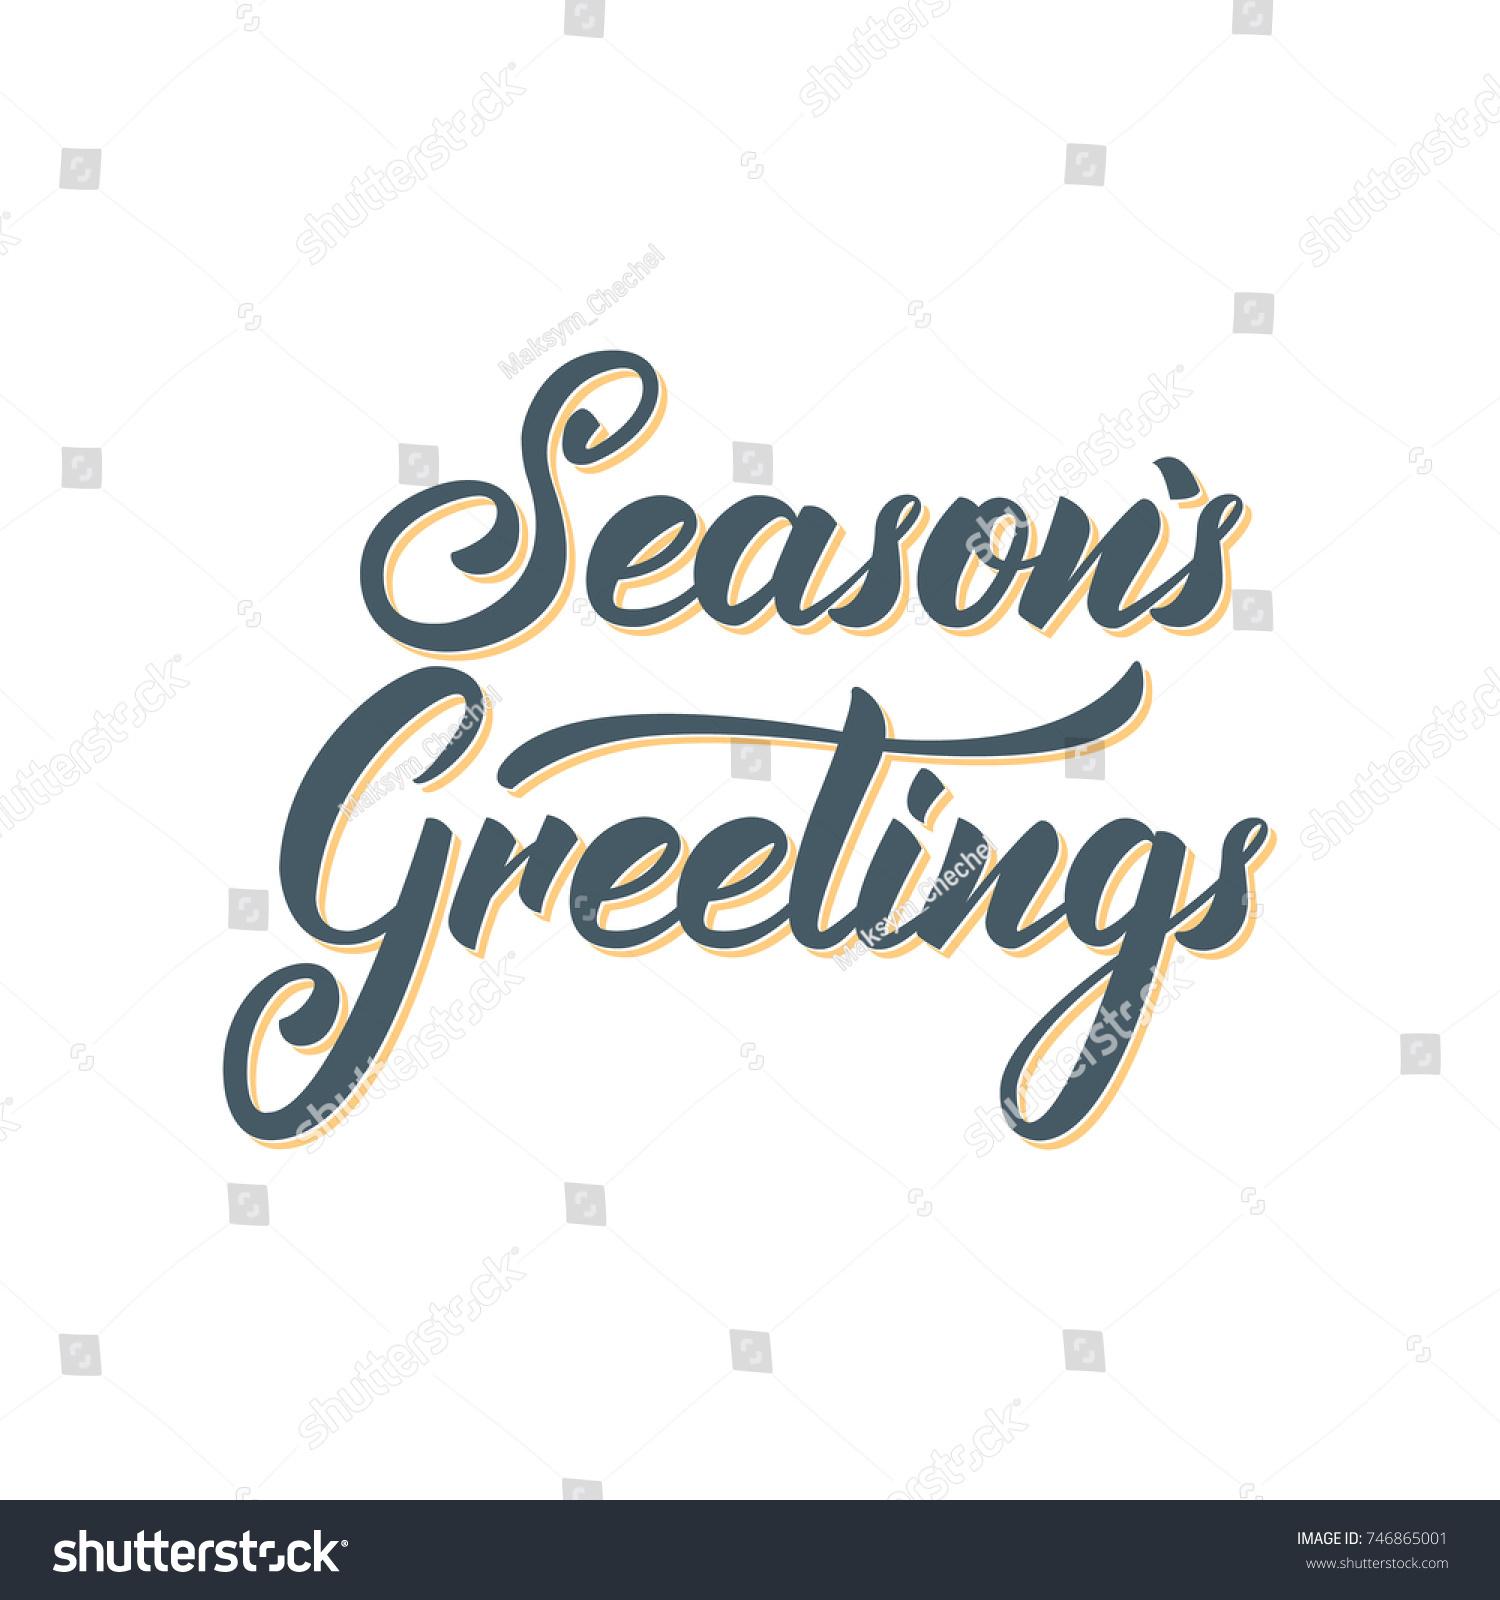 Seasons greetings text lettering design christmas stock vector seasons greetings text lettering design christmas and new year greeting typography kristyandbryce Images